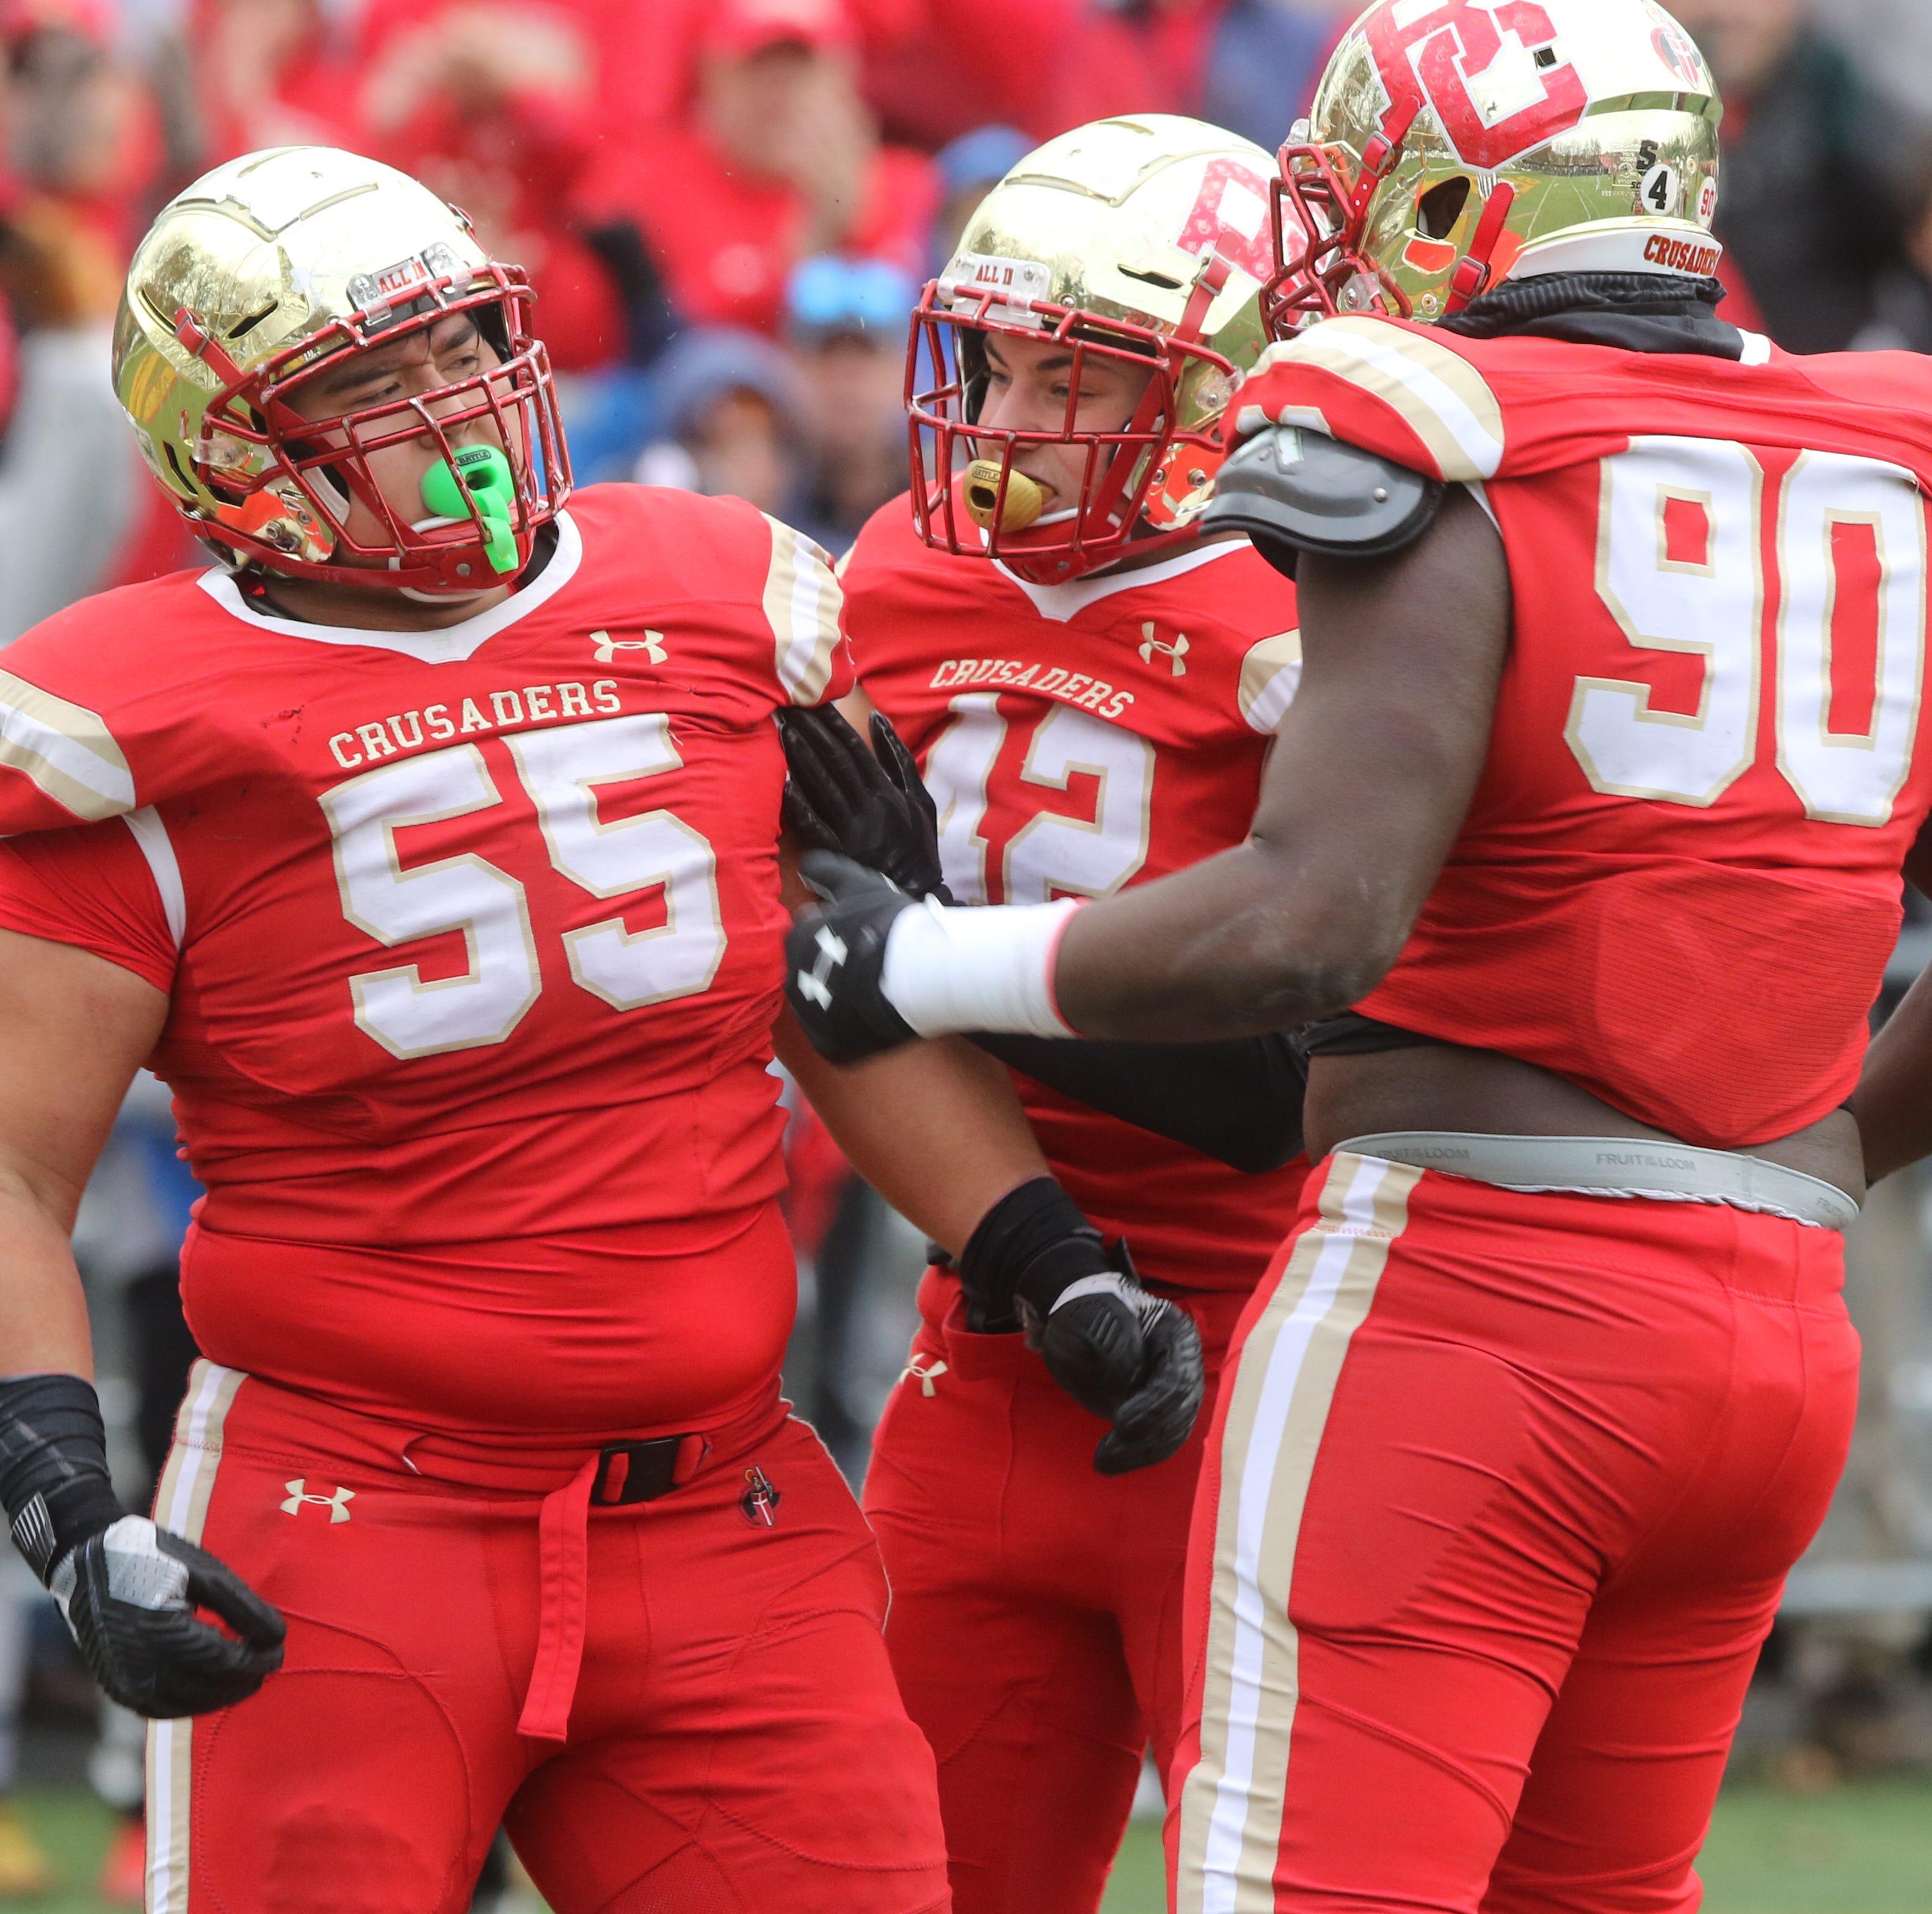 NJ high school football playoffs: Bowl Game matchups at MetLife Stadium